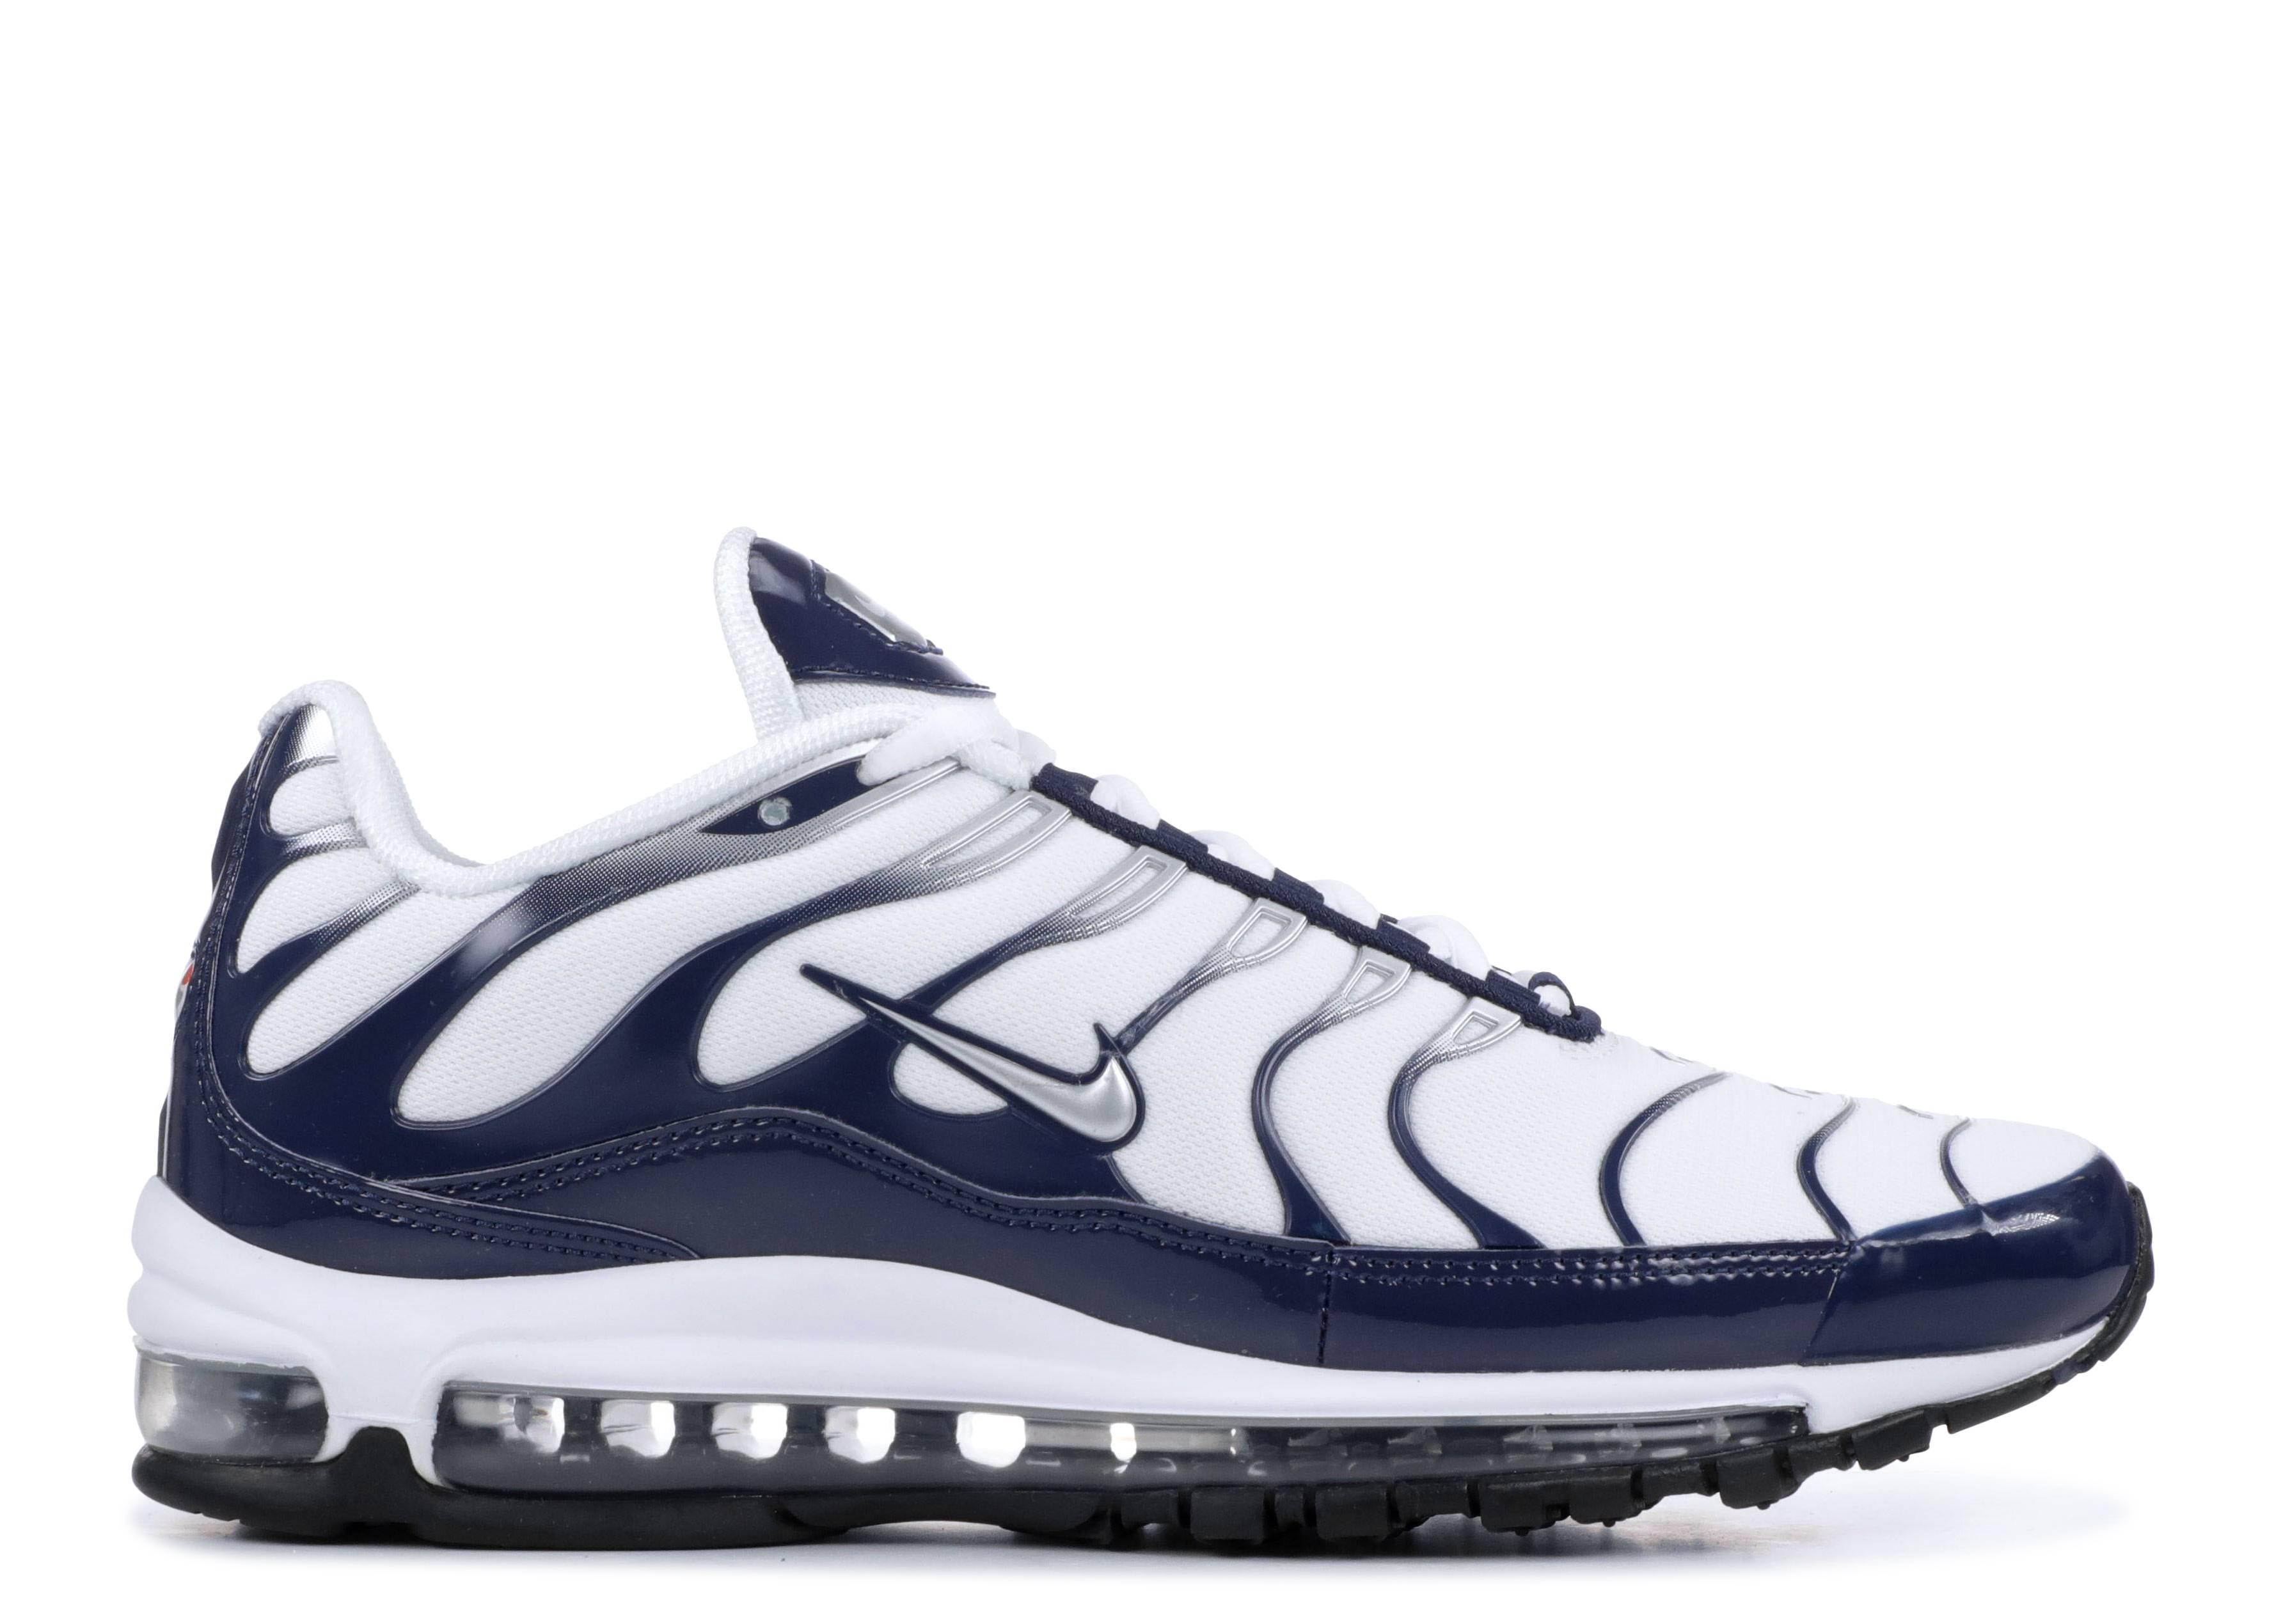 Nike Air Max 97 Plus Shoe in Blue